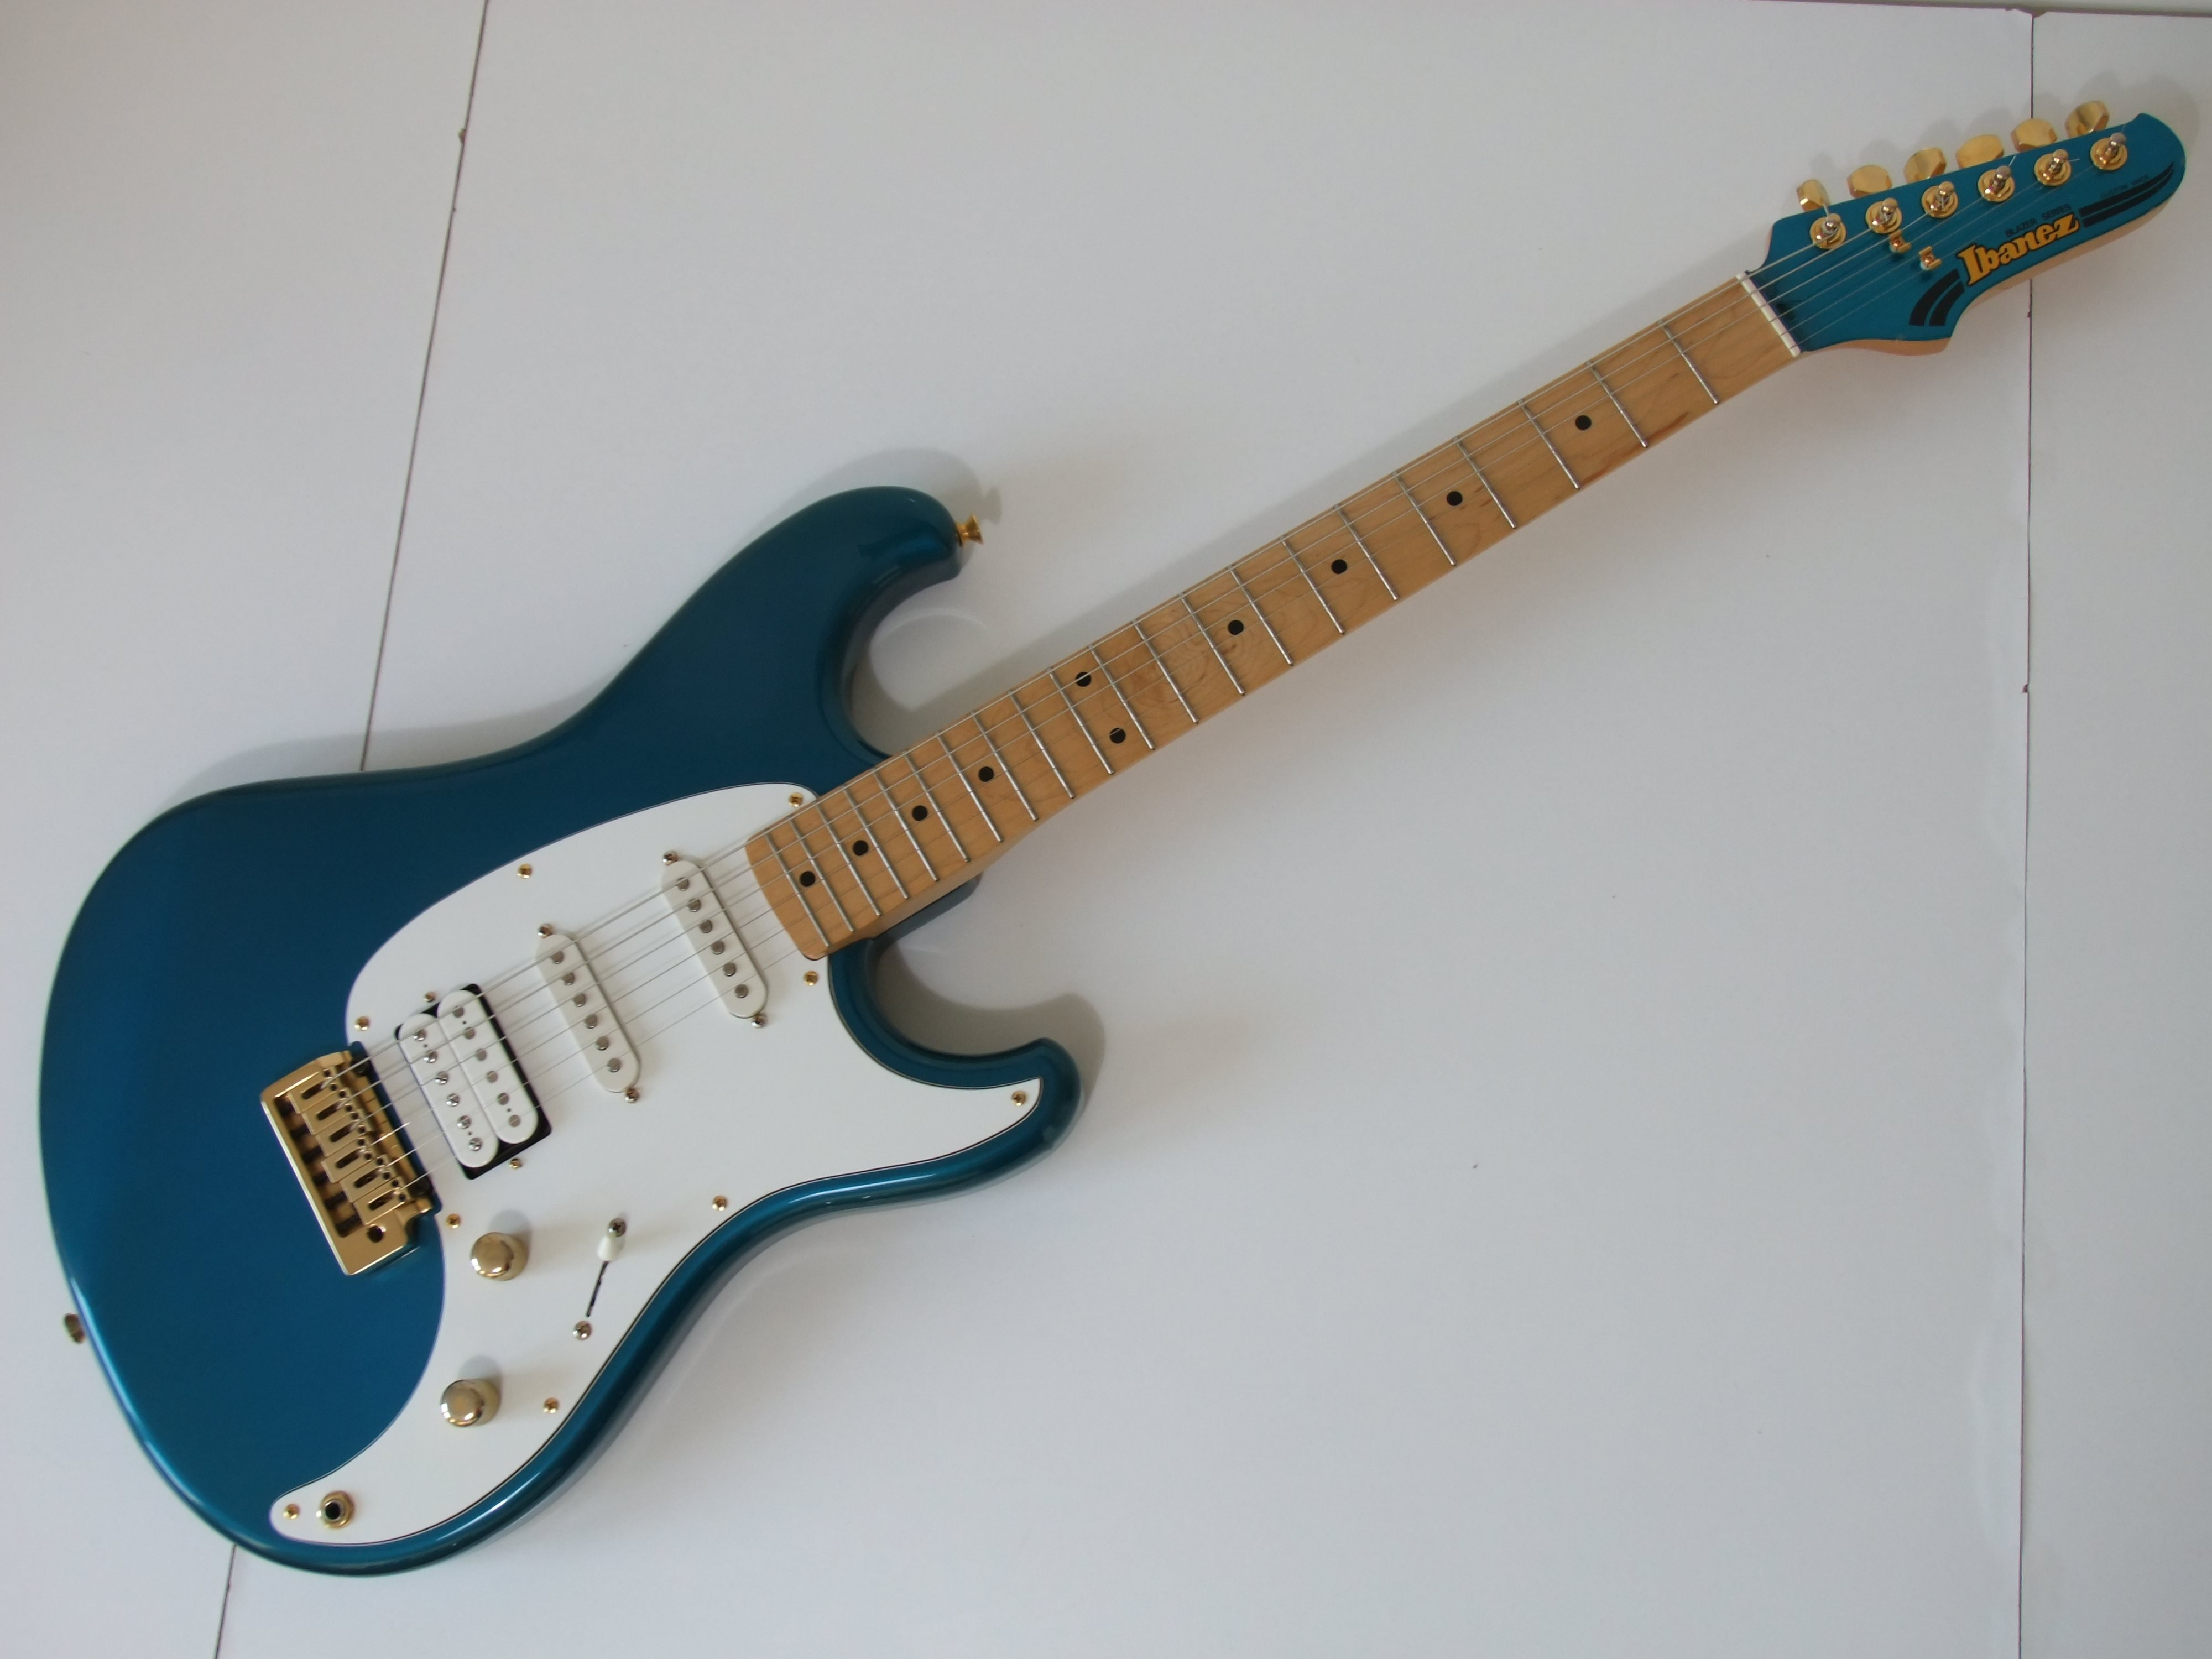 rg560 ibanez guitar wiring diagram block and schematic diagrams u2022 rh lazysupply co